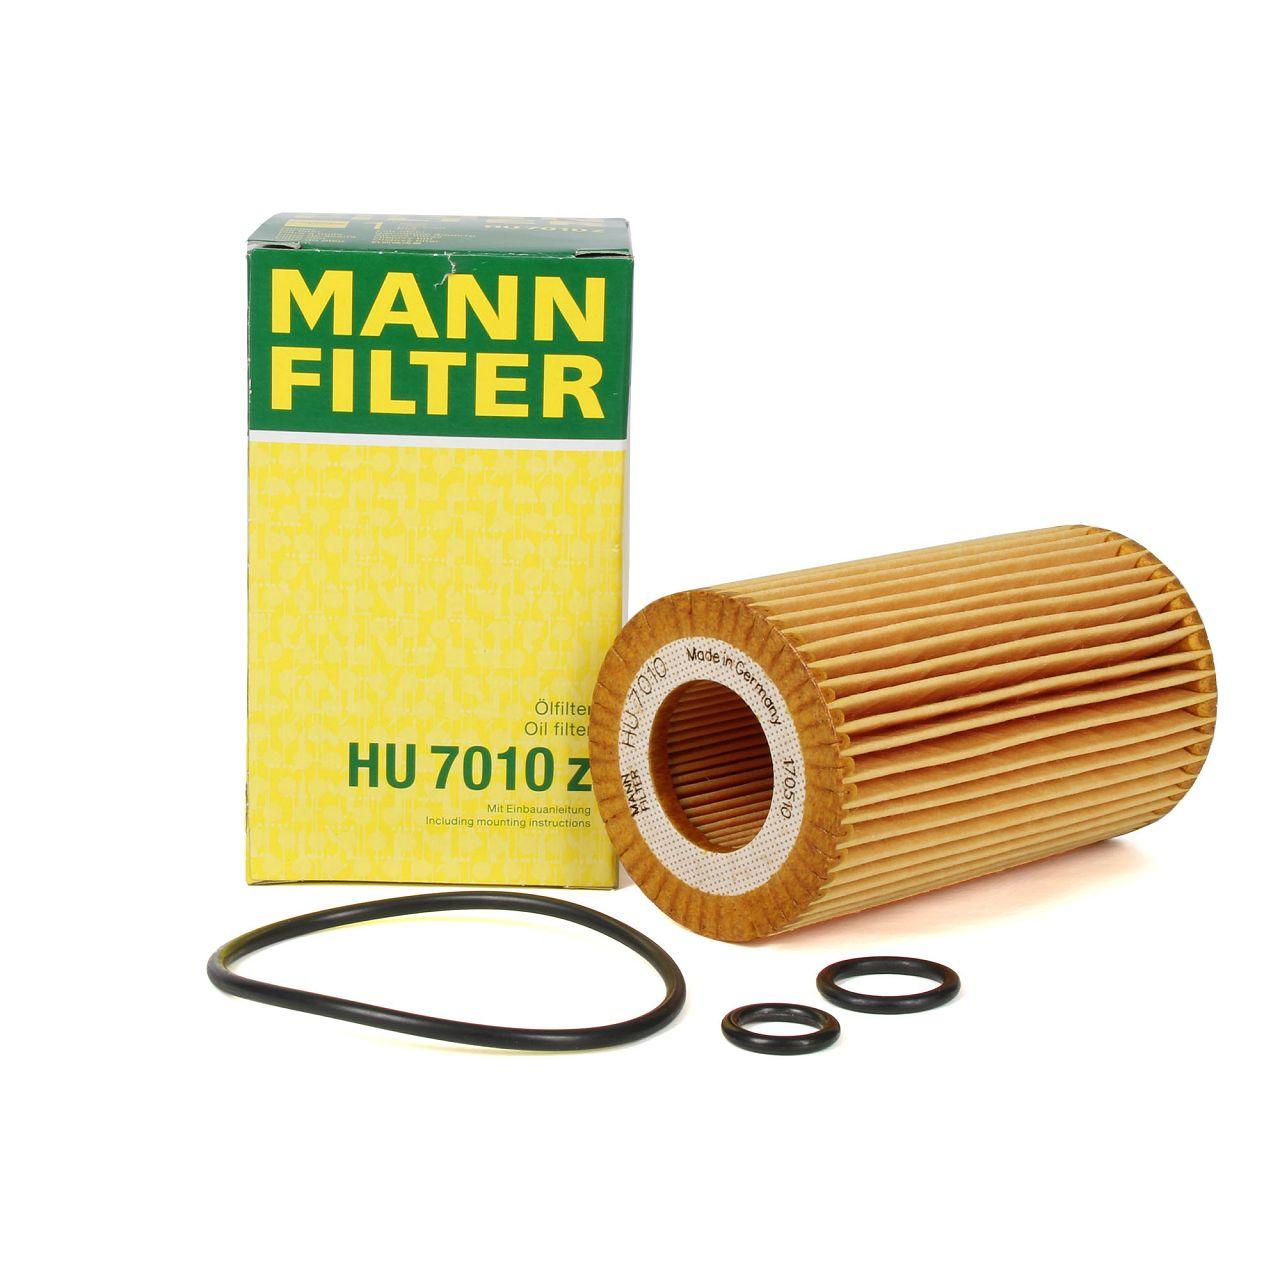 MANN Ölfilter HU7010z MERCEDES W176 W246 W204 W205 W212 X156 W221 W222 DIESEL